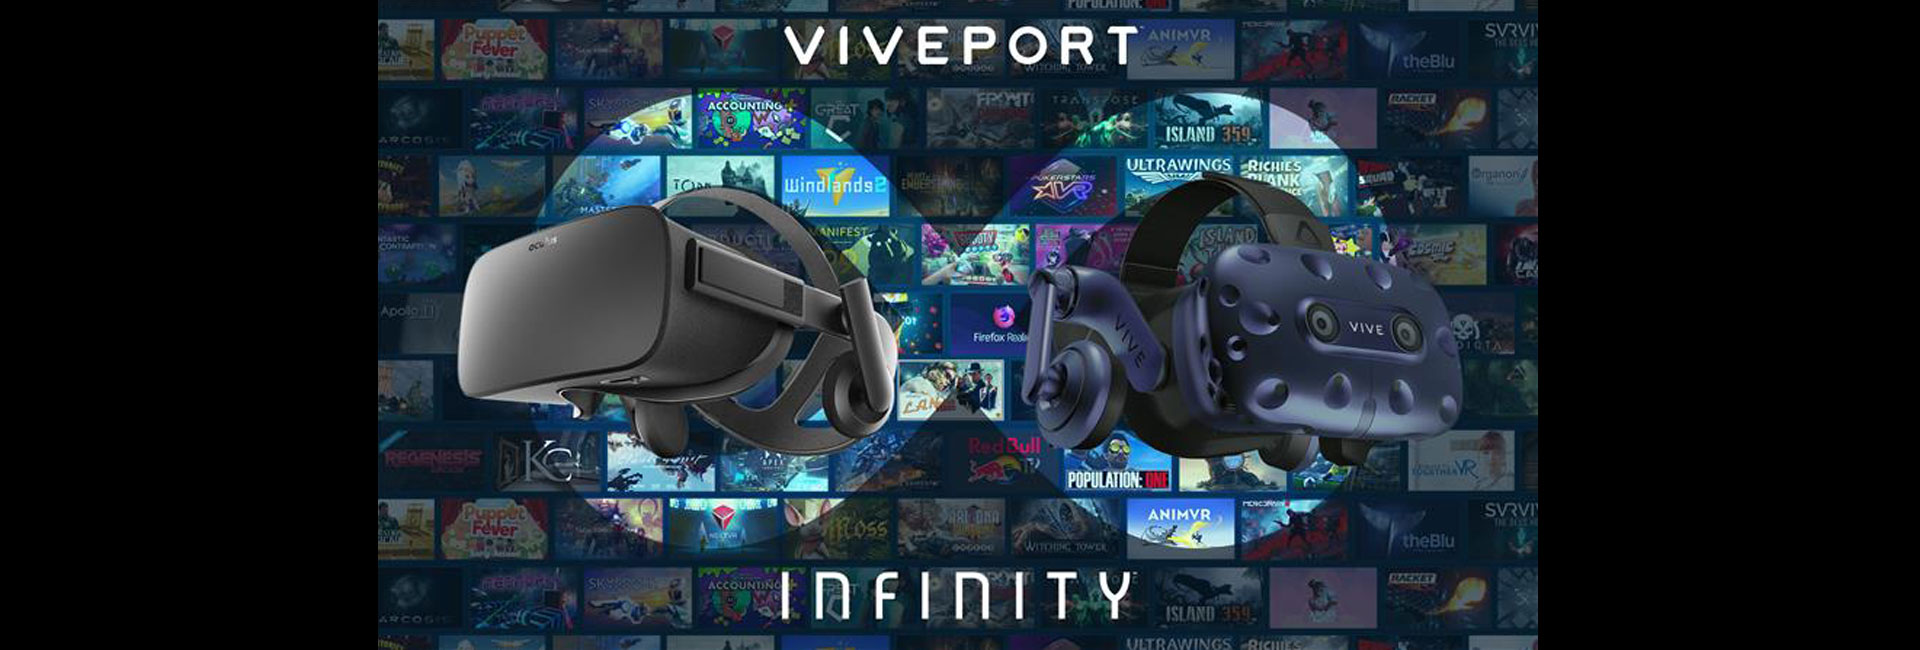 viveport_infinity